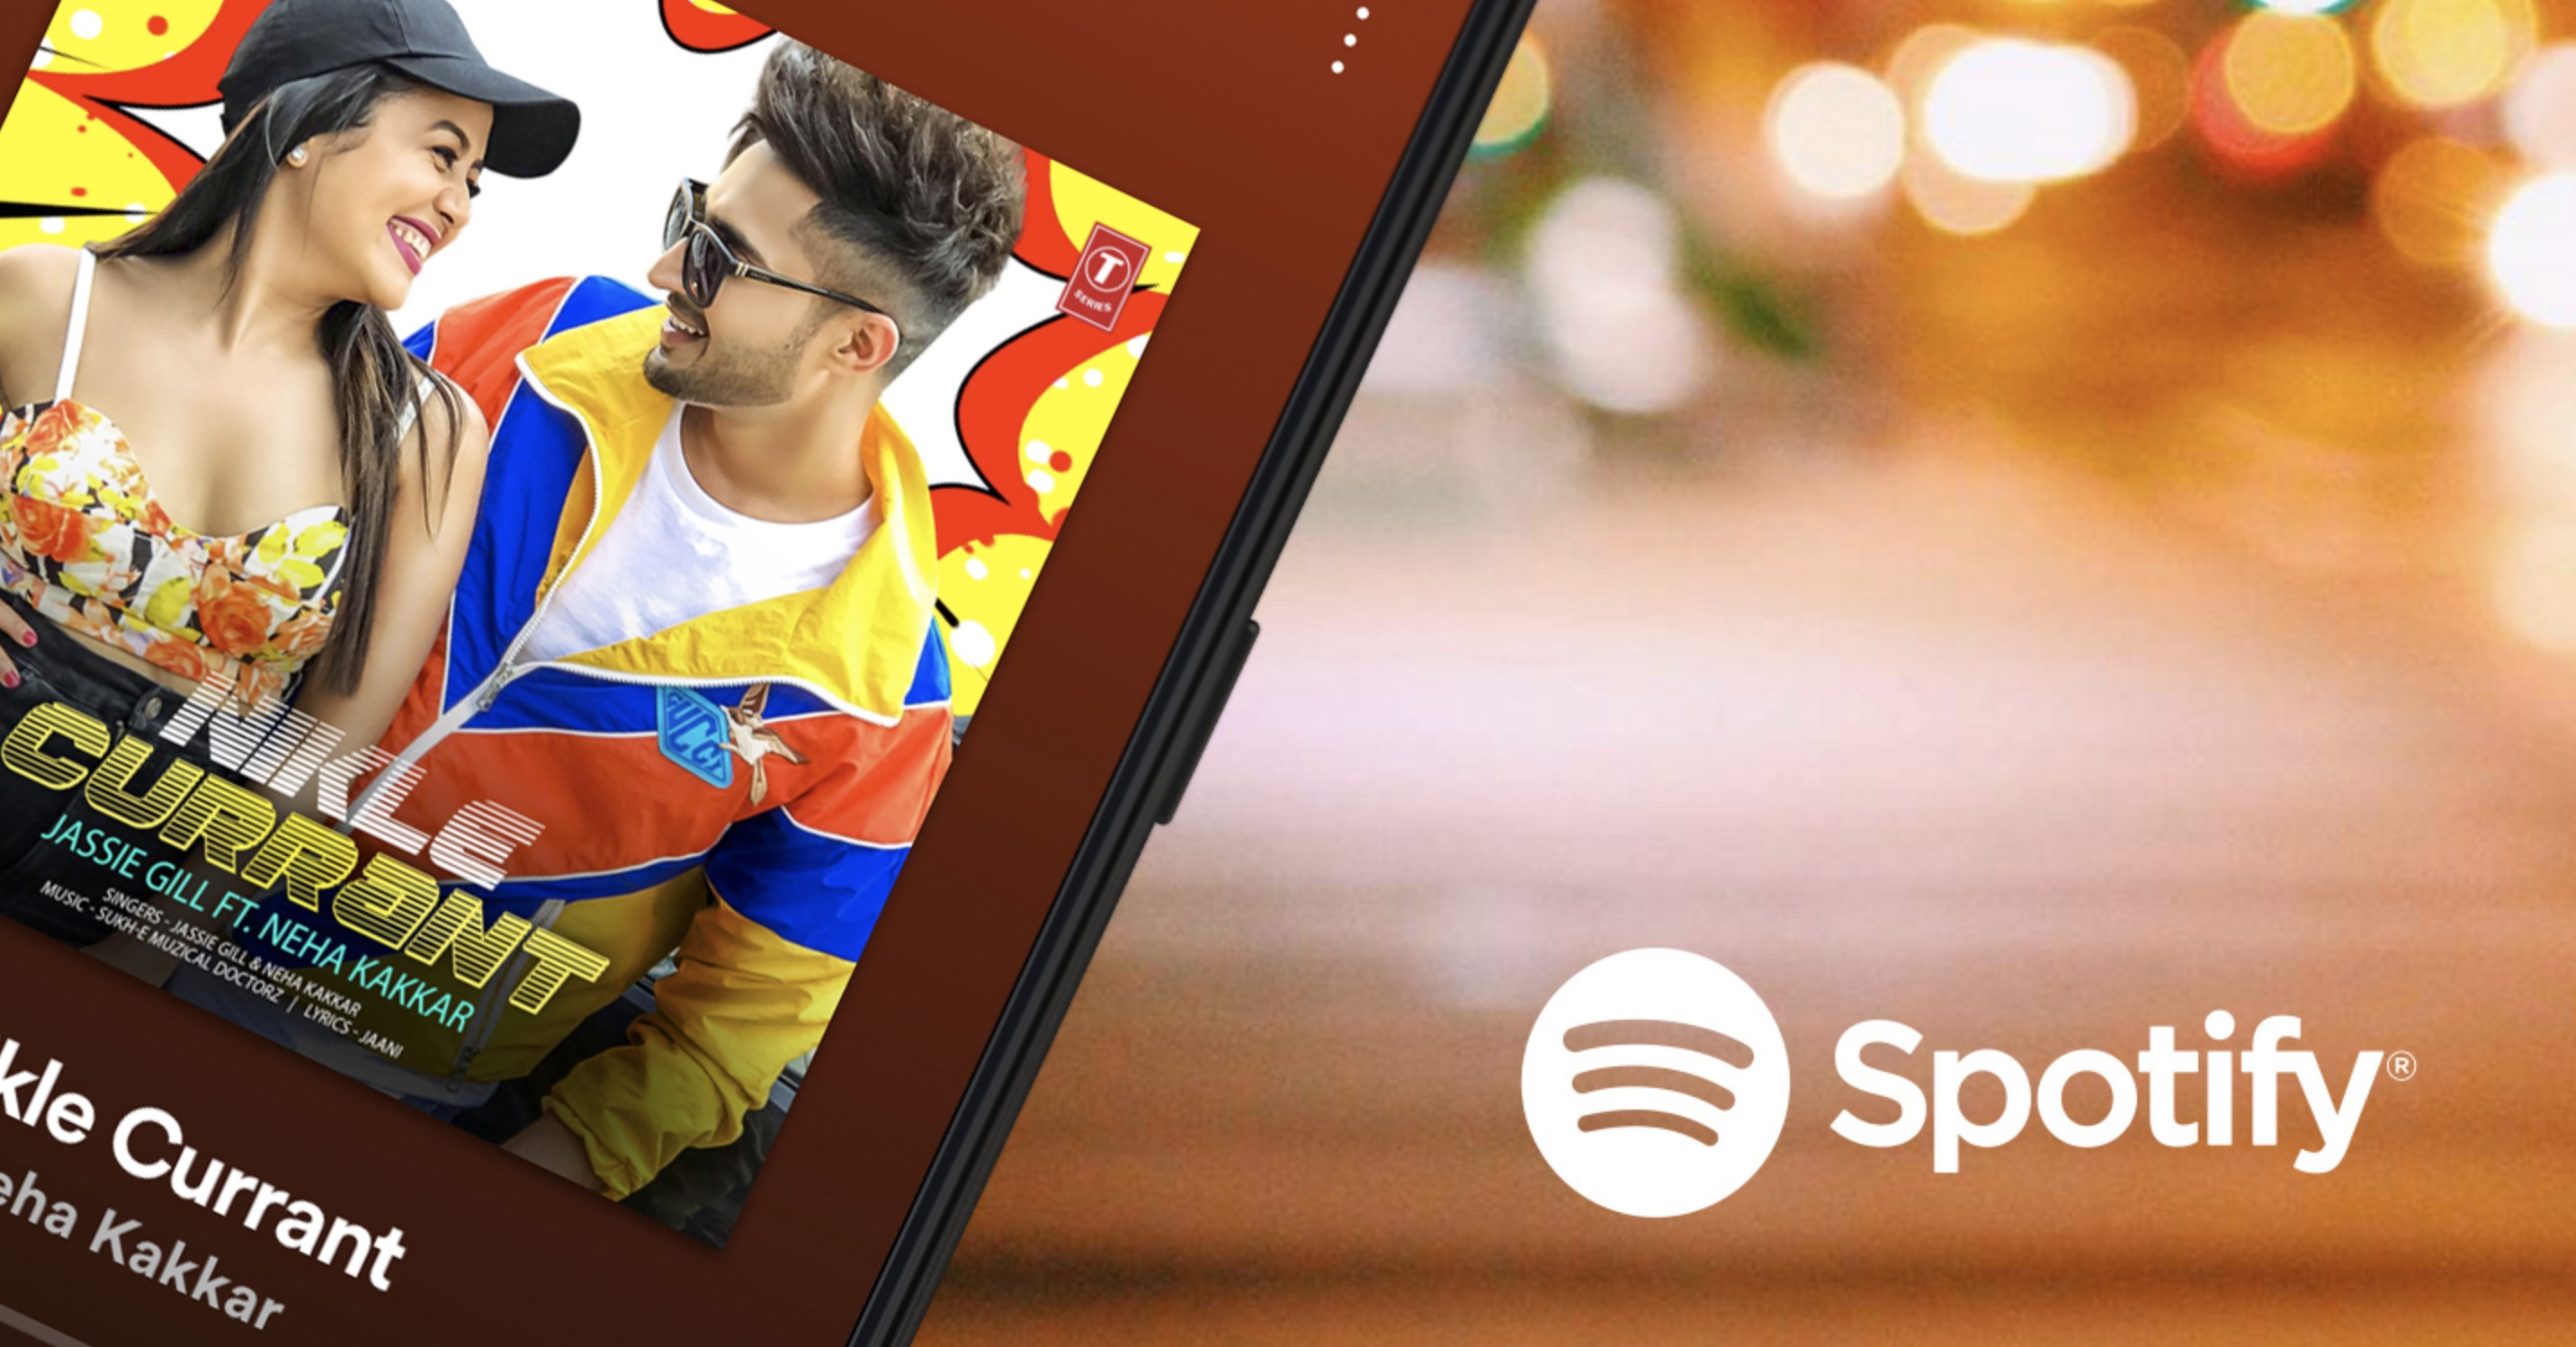 spotify-india.jpg